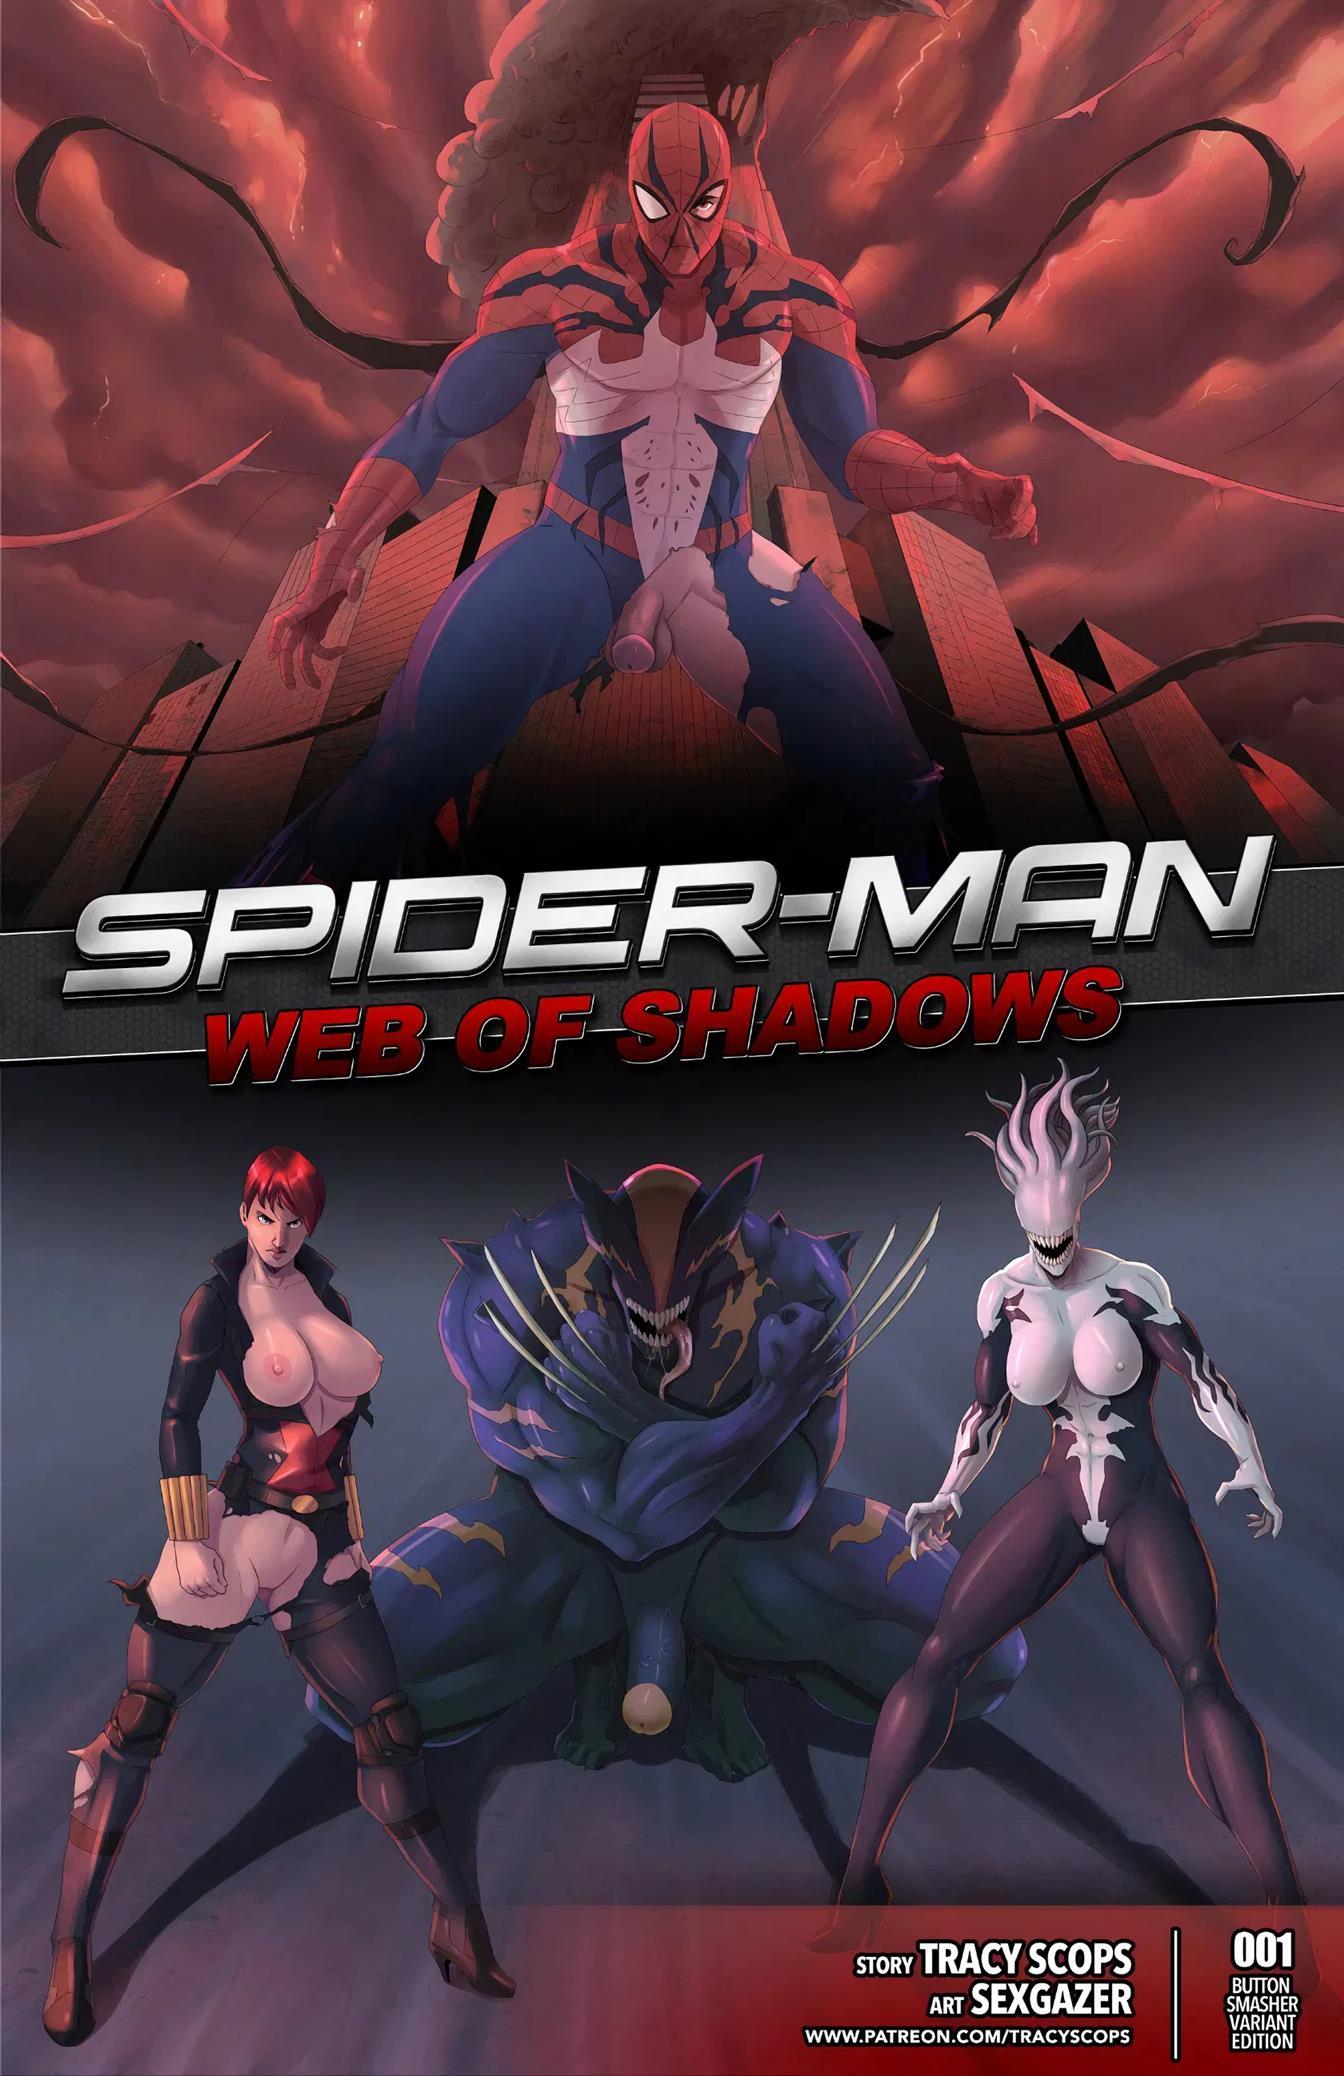 Web Of Shadows [TracyScops]